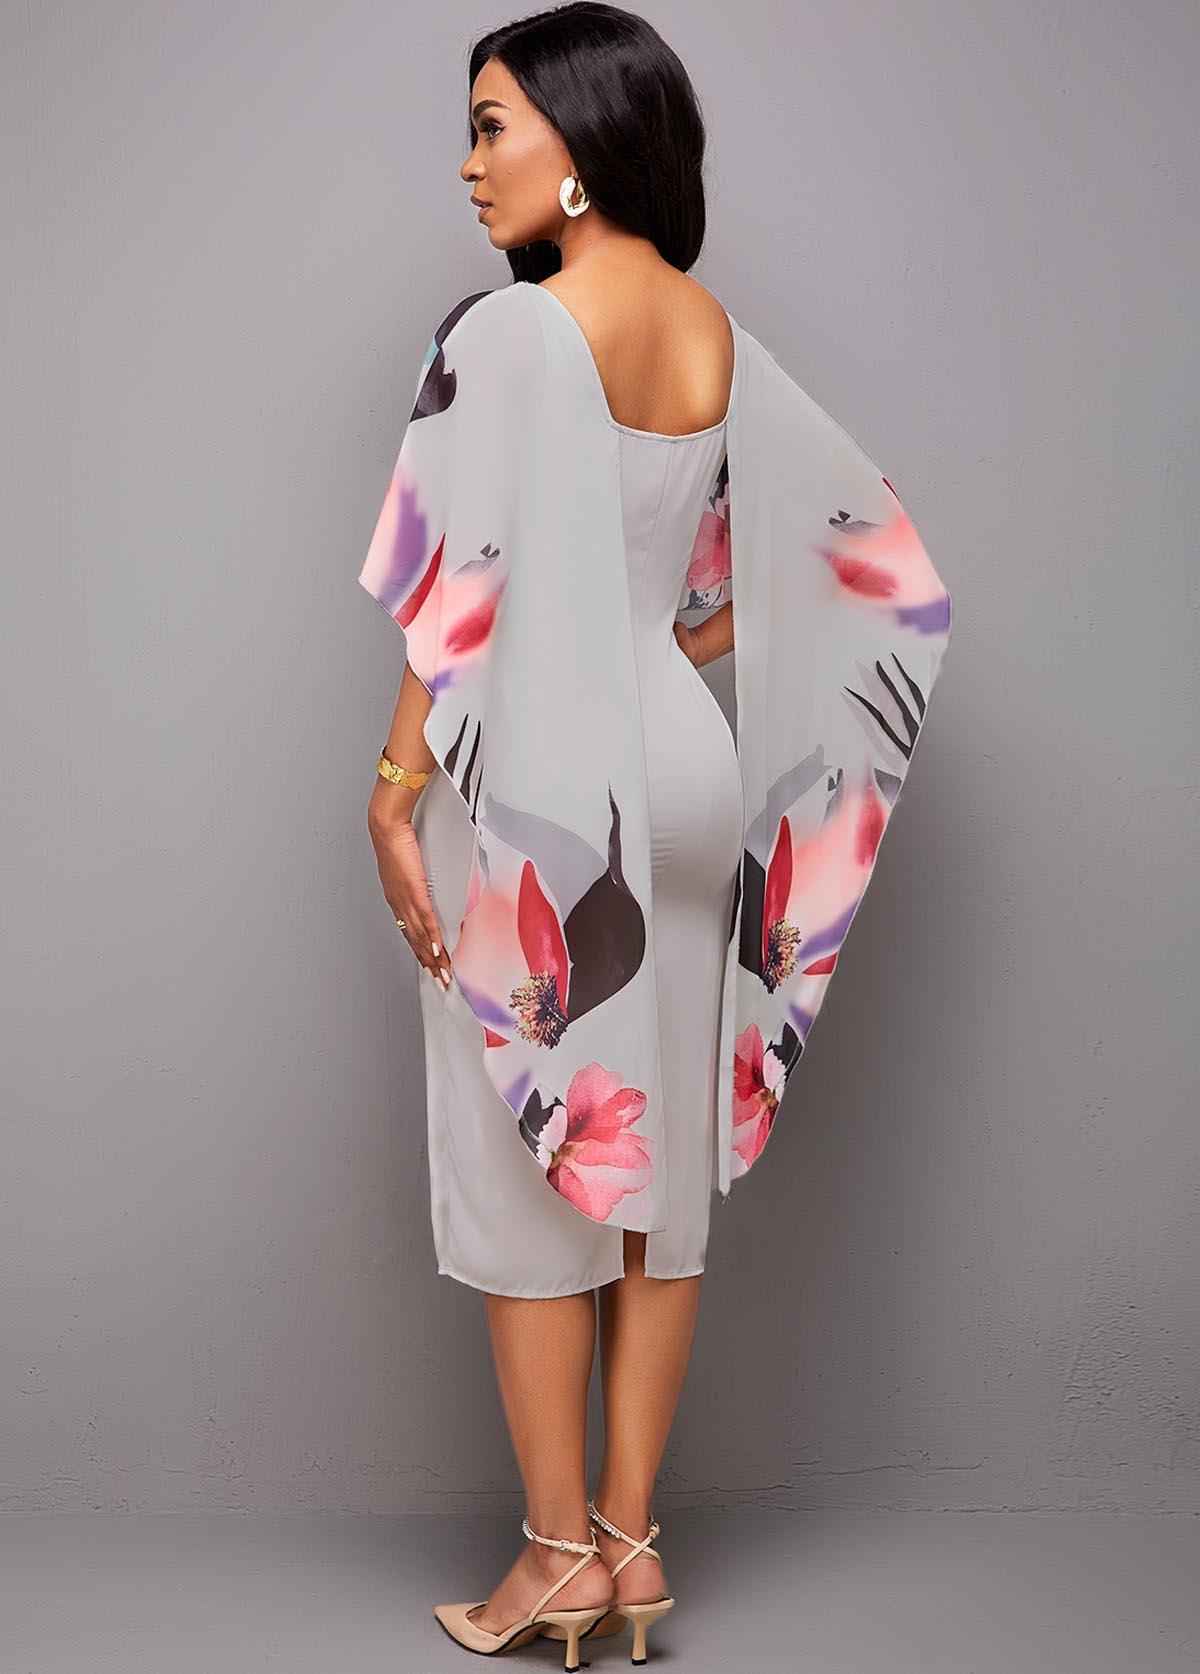 Floral Print 3/4 Sleeve Bodycon Dress